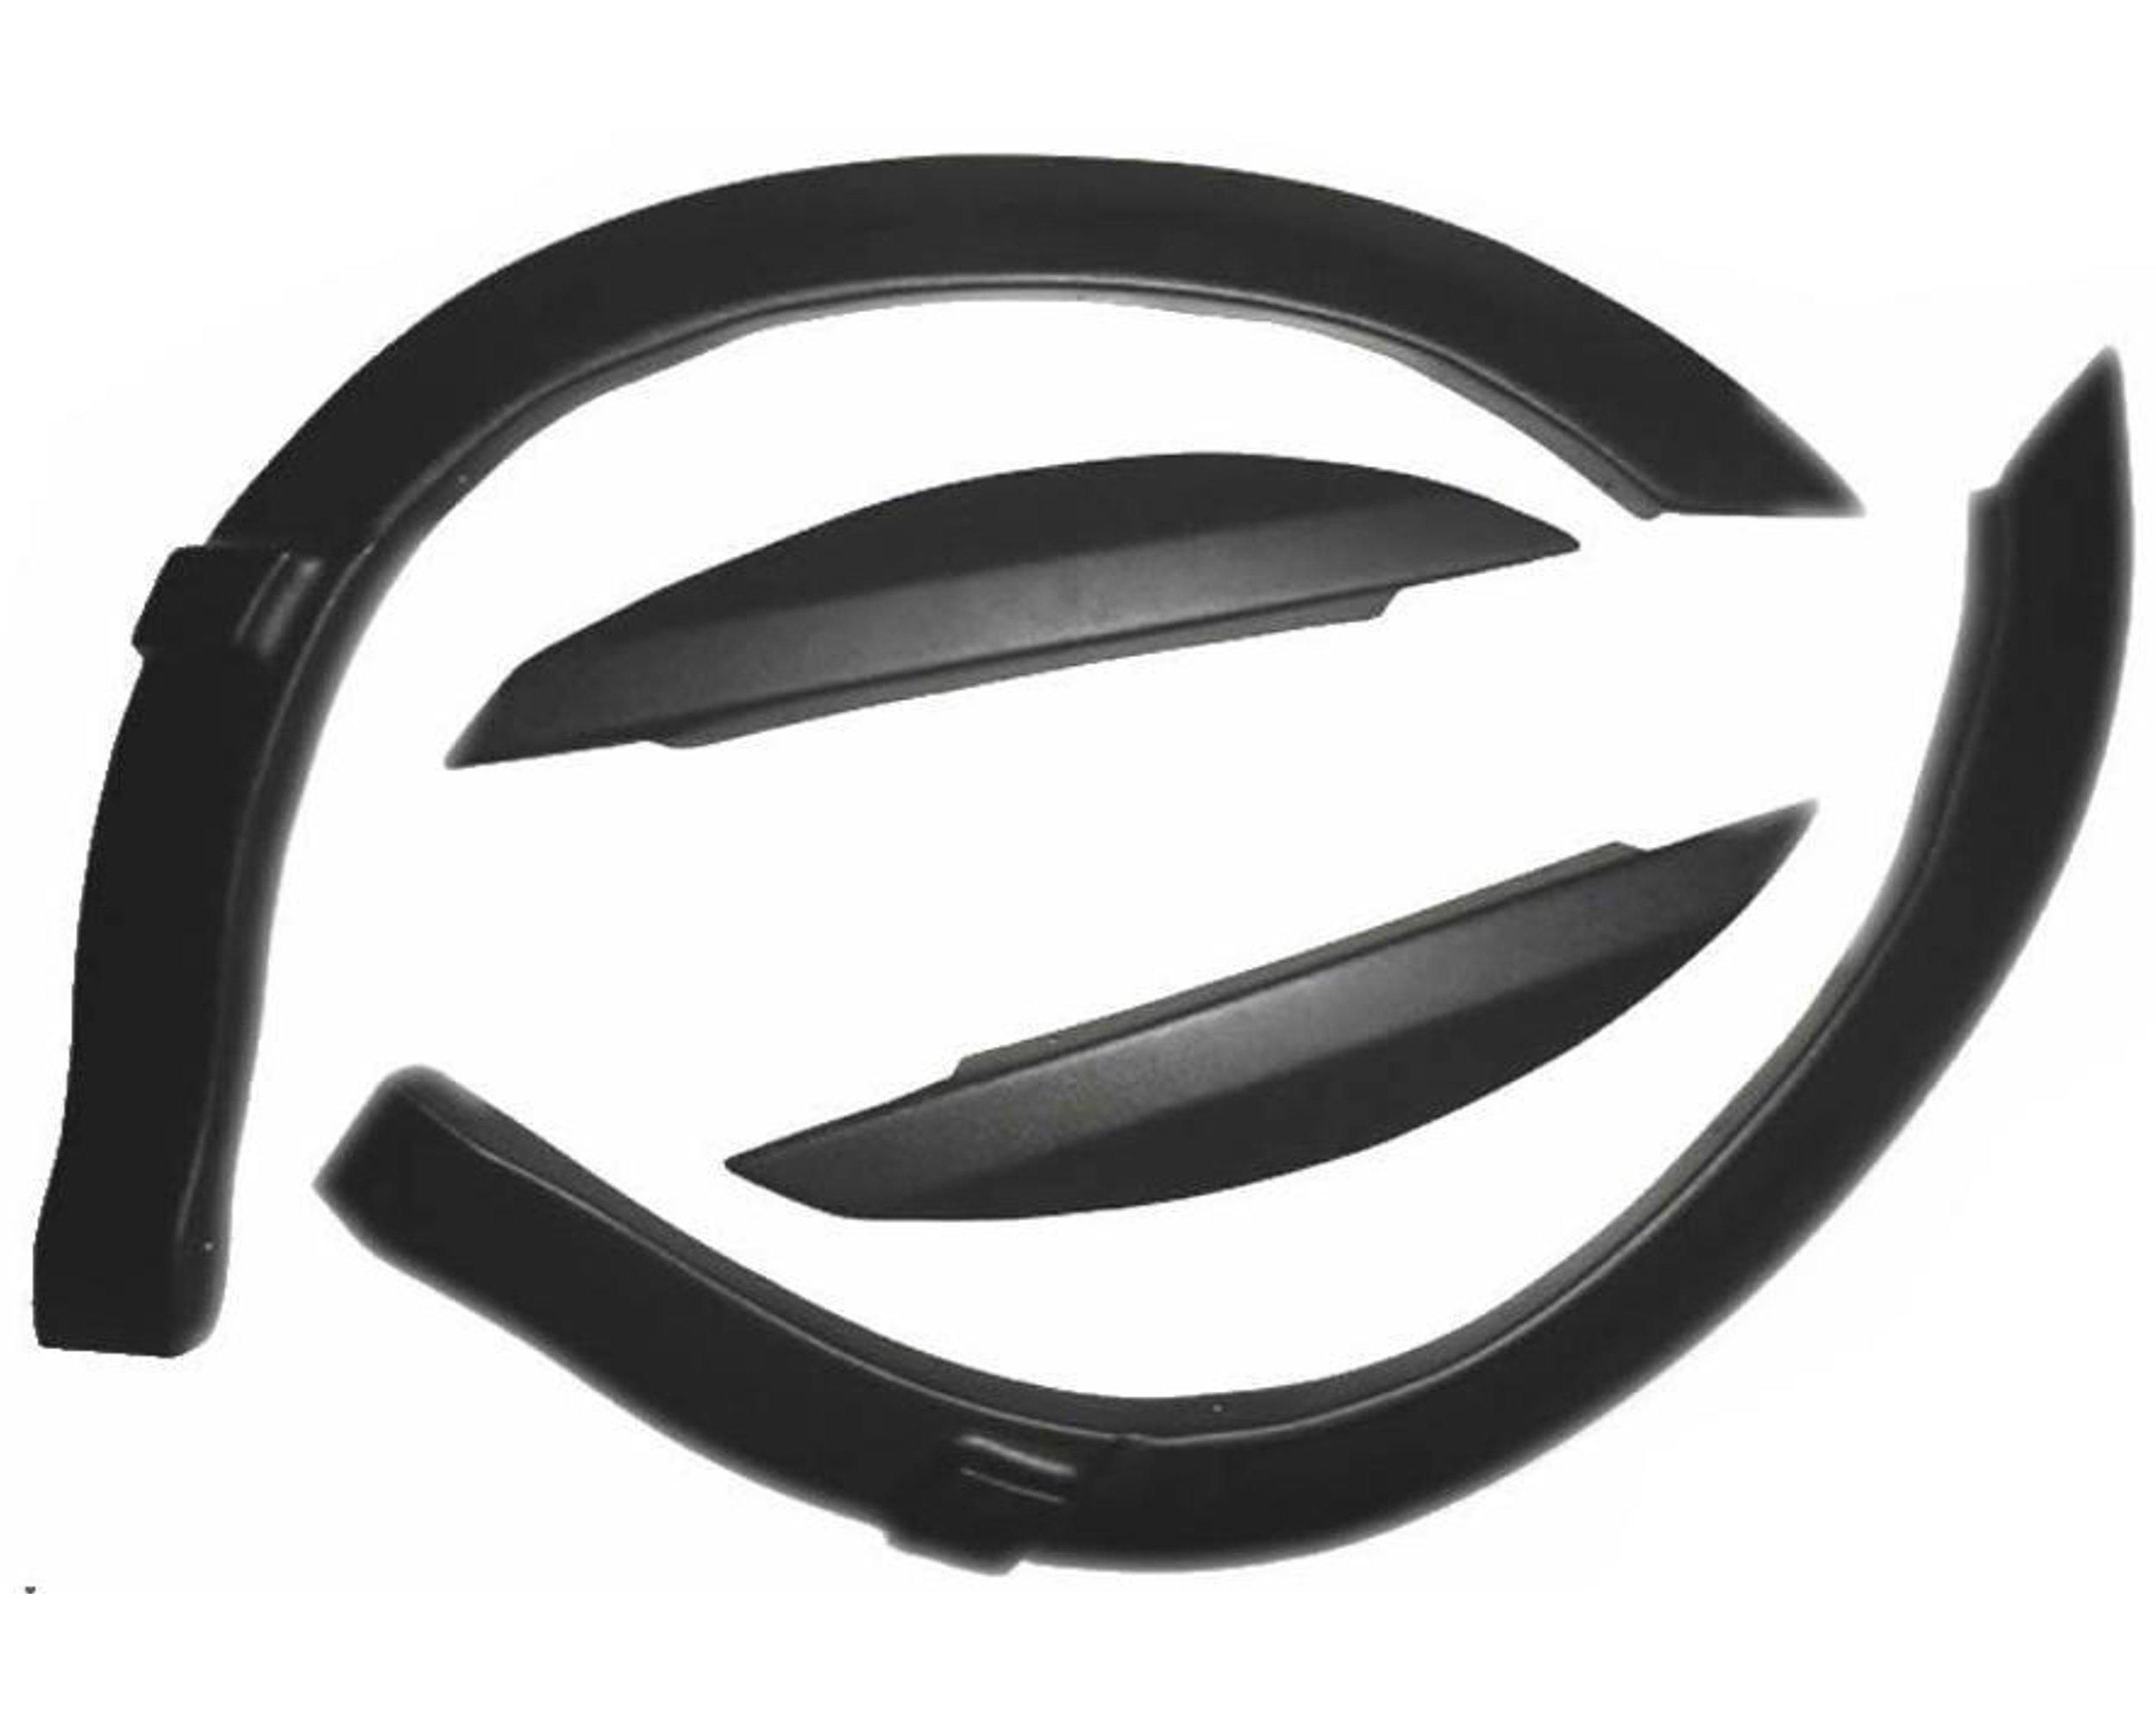 накладки защитные на крыло opel astra ii g